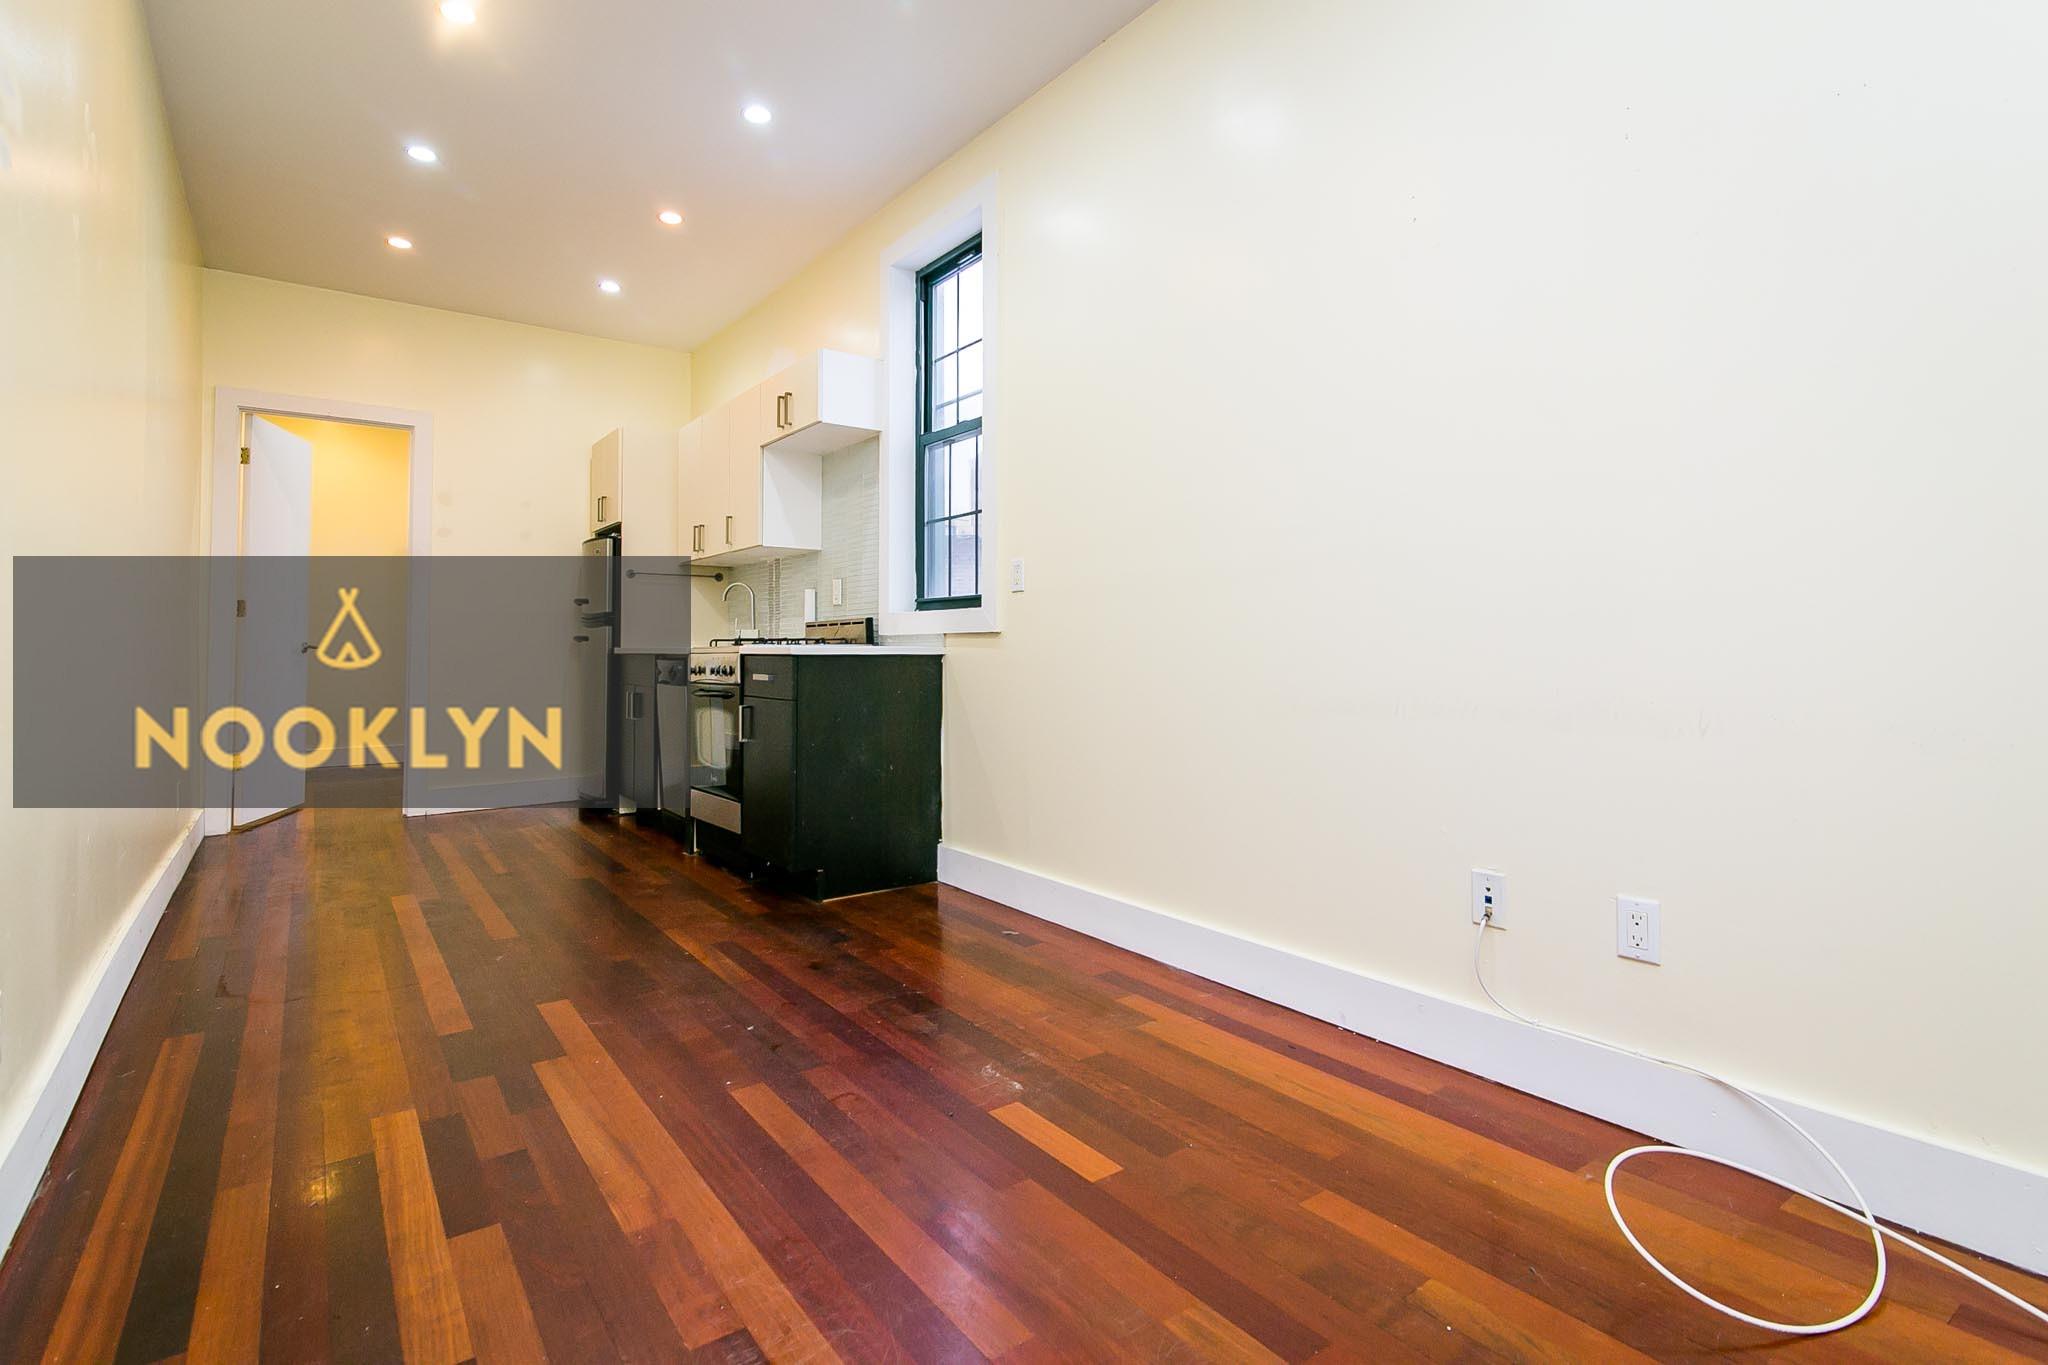 276 Boerum Street #2B, Brooklyn, NY 11206 3 Bedroom